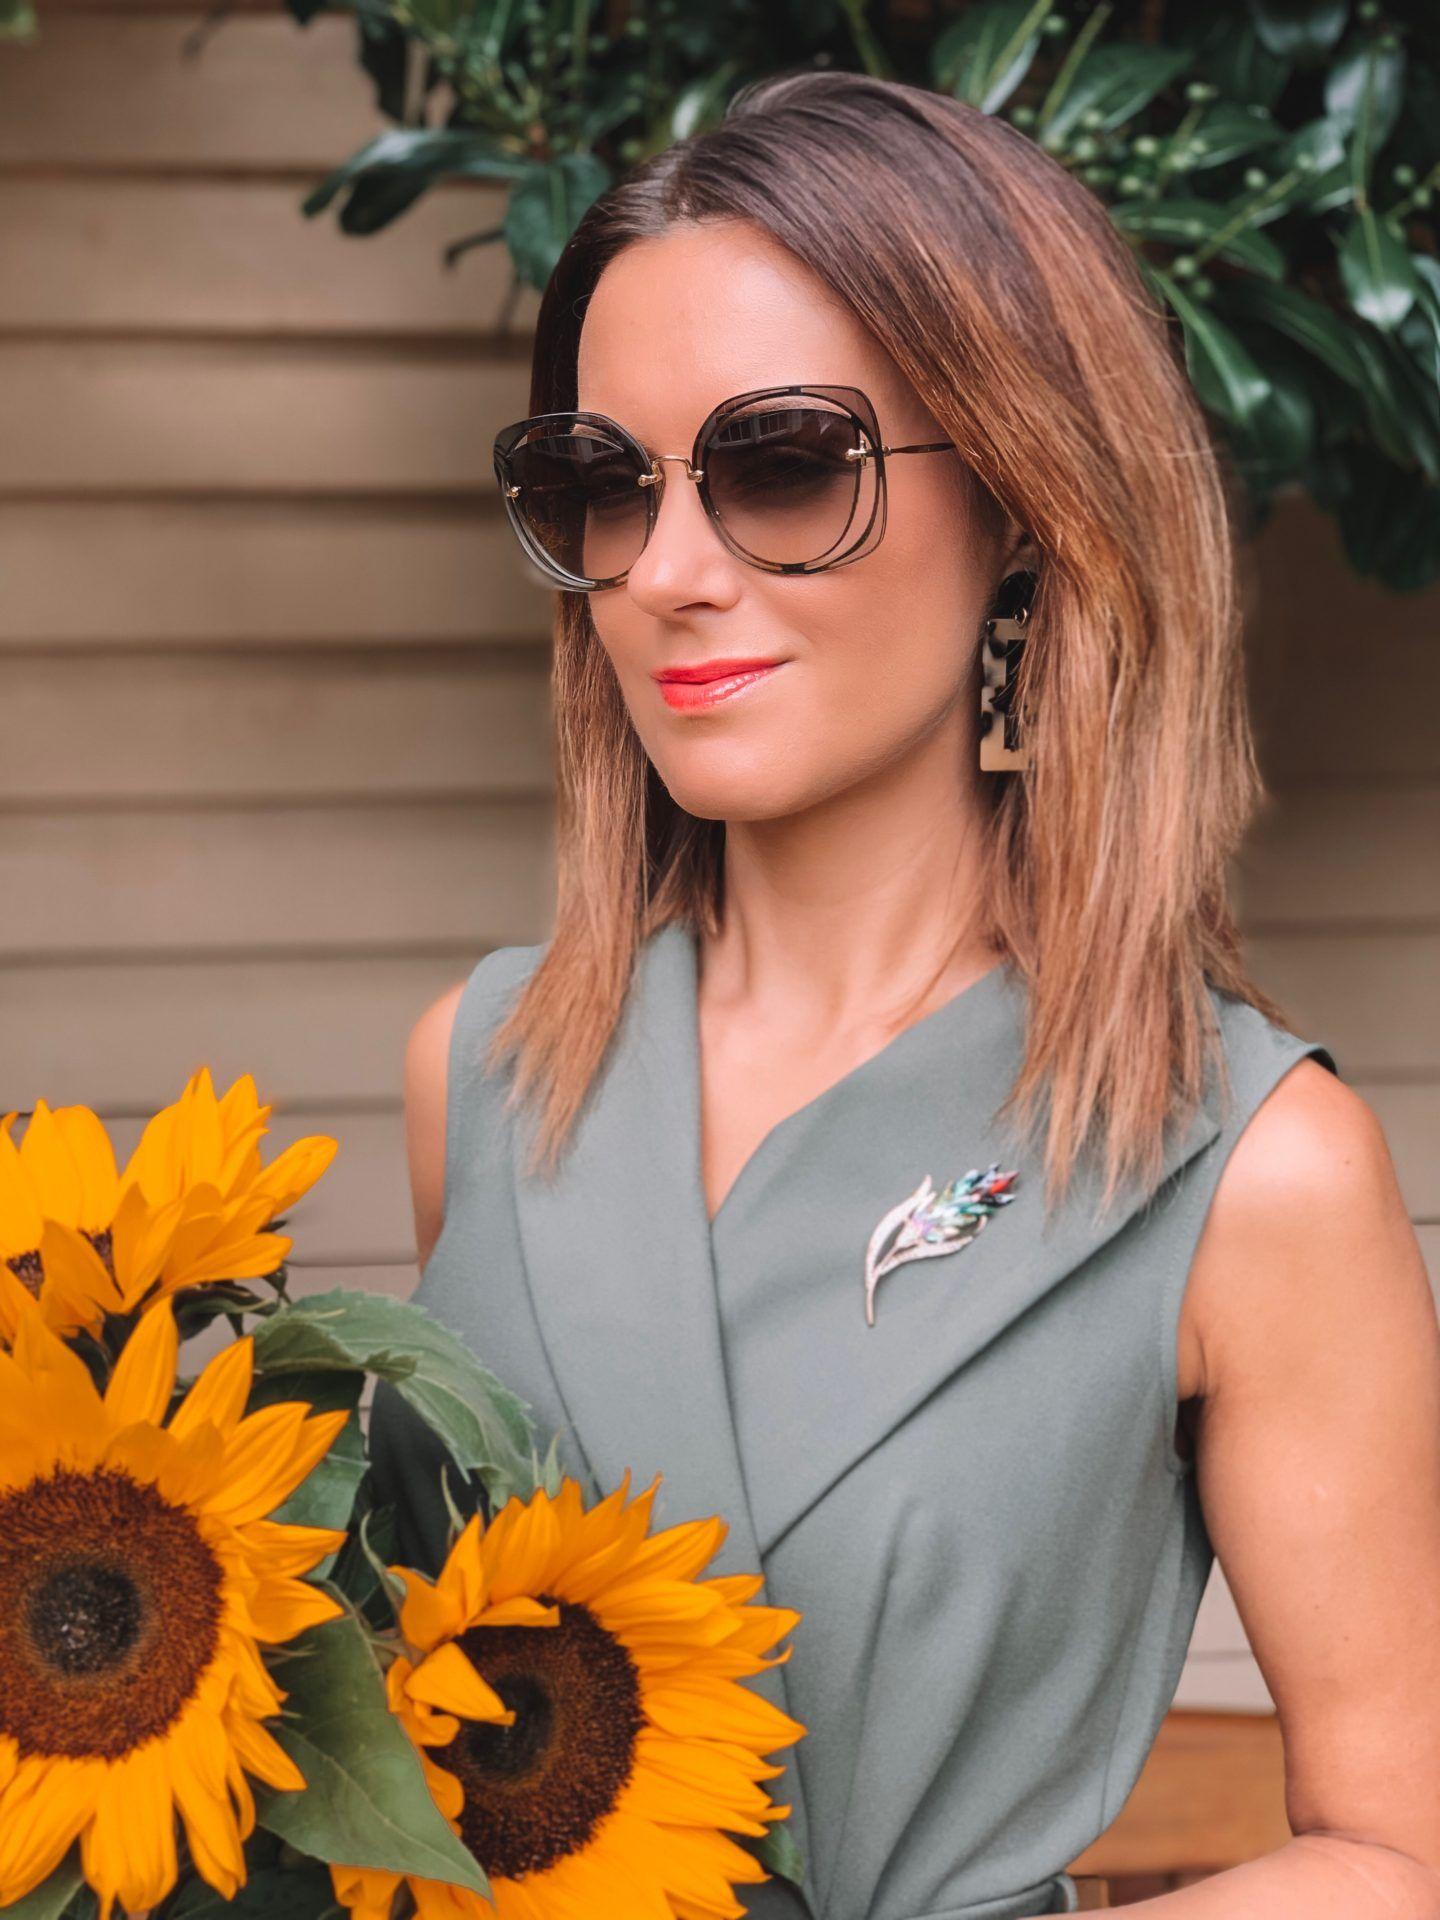 Closet London Khaki Collared Midi Pencil Dress | Elegant Duchess Boutique brooch | Miu Miu sunglasses | River Island Bag